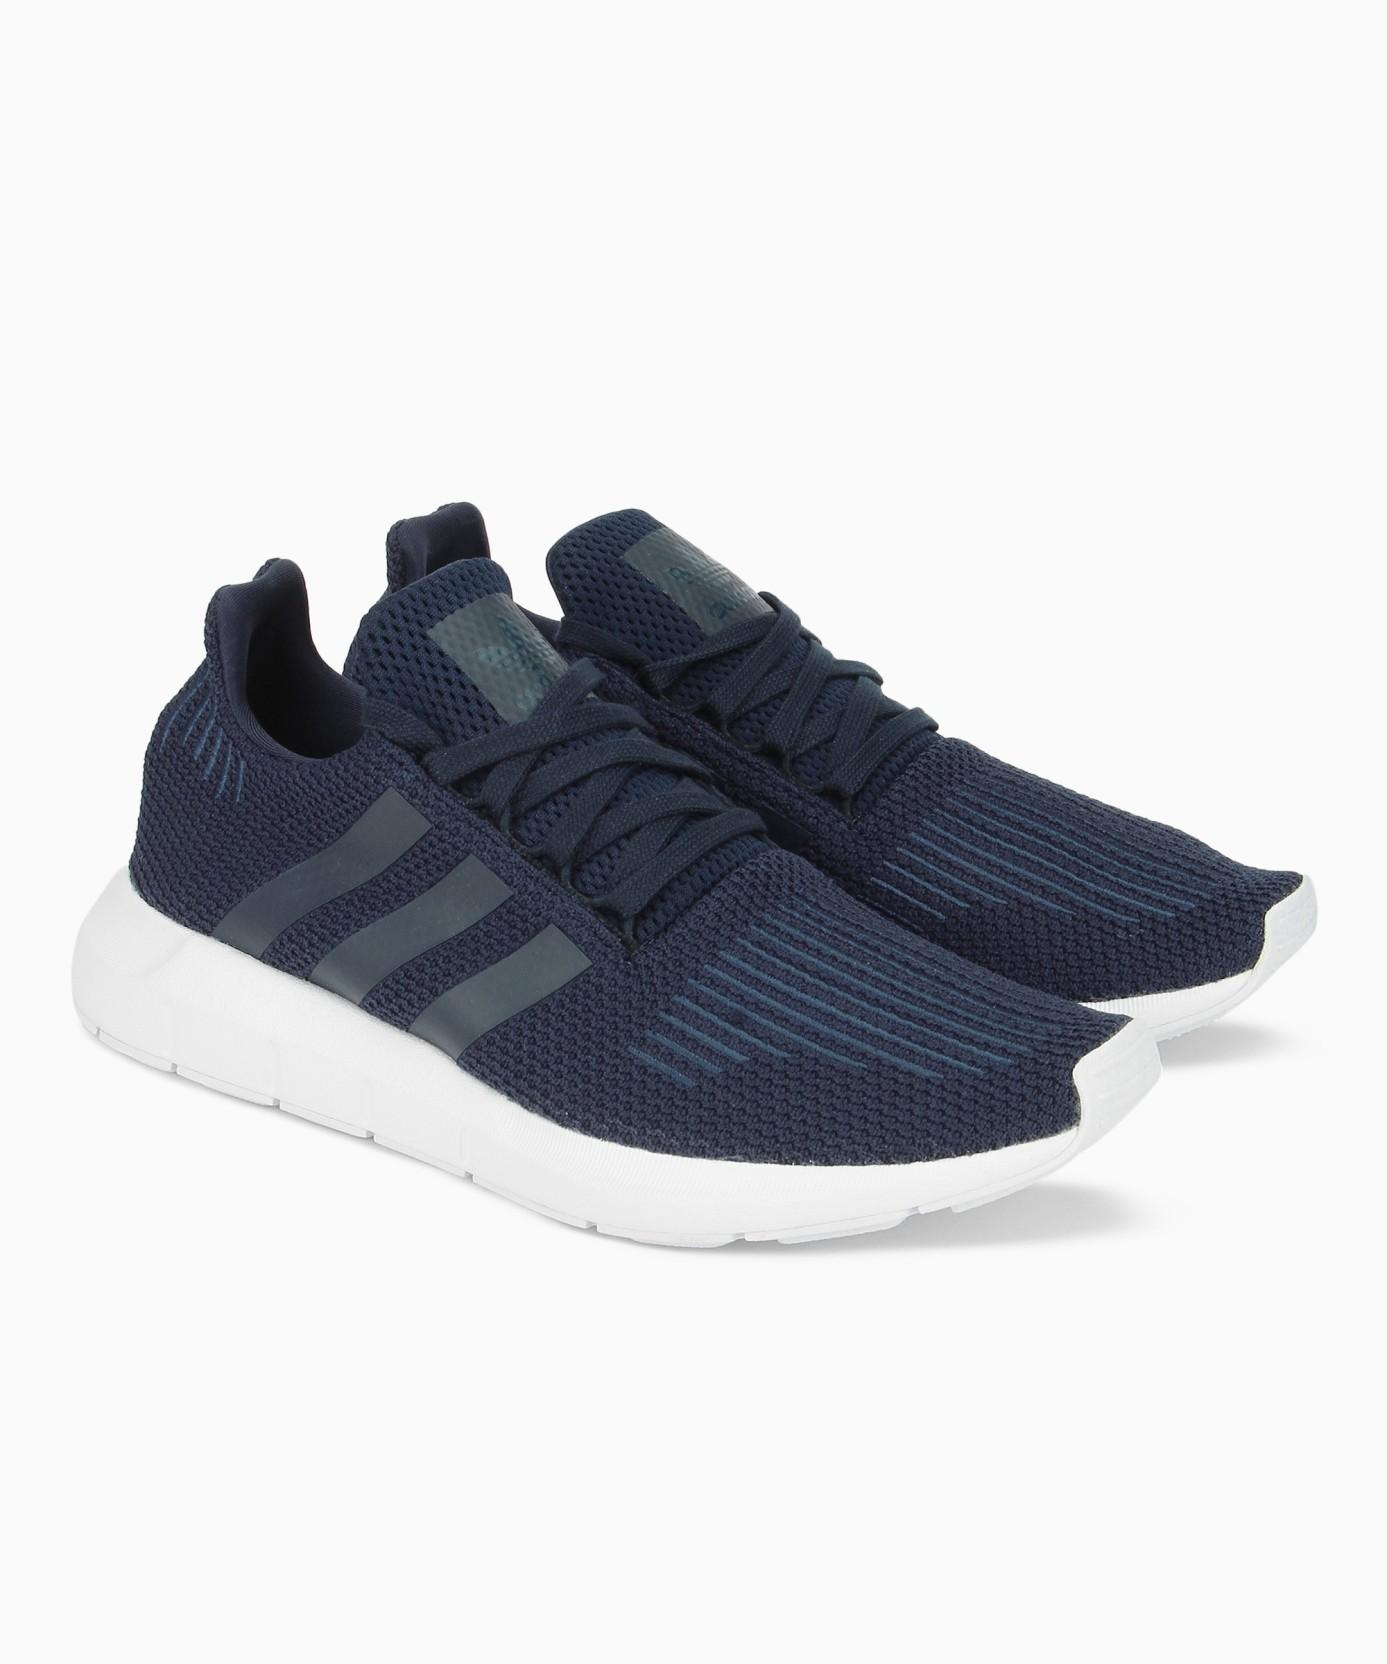 4d00ed24852aa ADIDAS ORIGINALS SWIFT RUN Running Shoe For Men - Buy ADIDAS ...